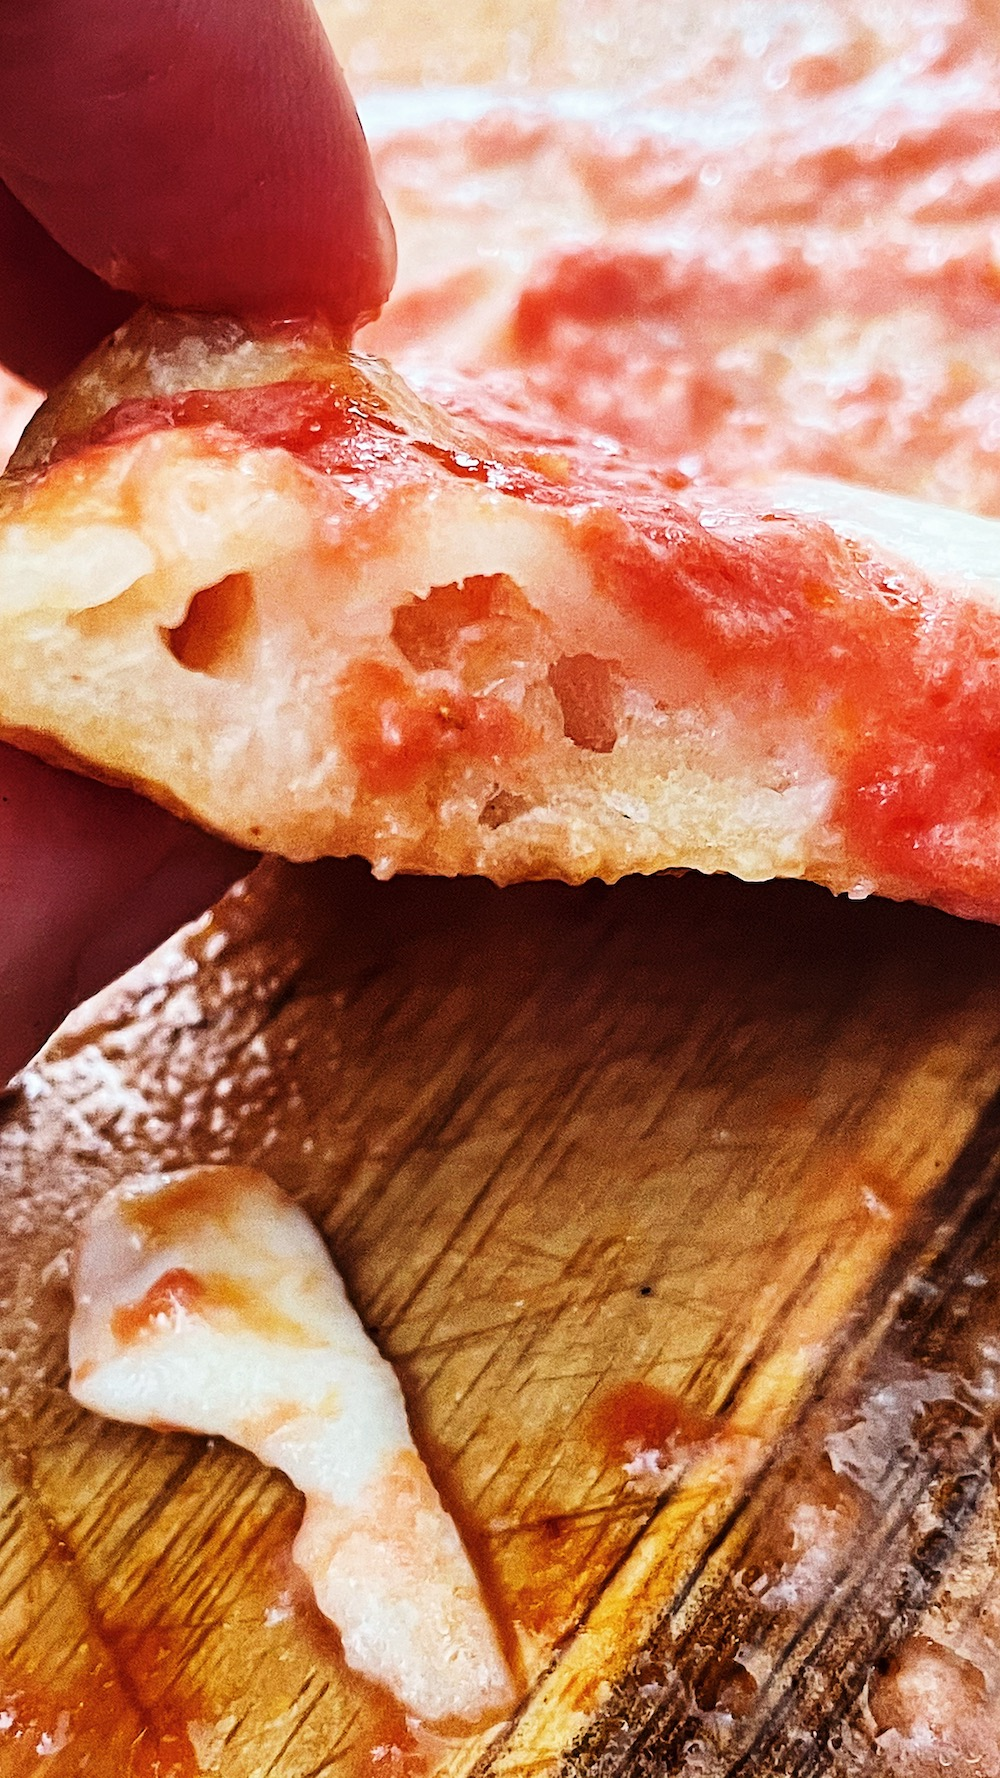 chewy Italian pizza dough